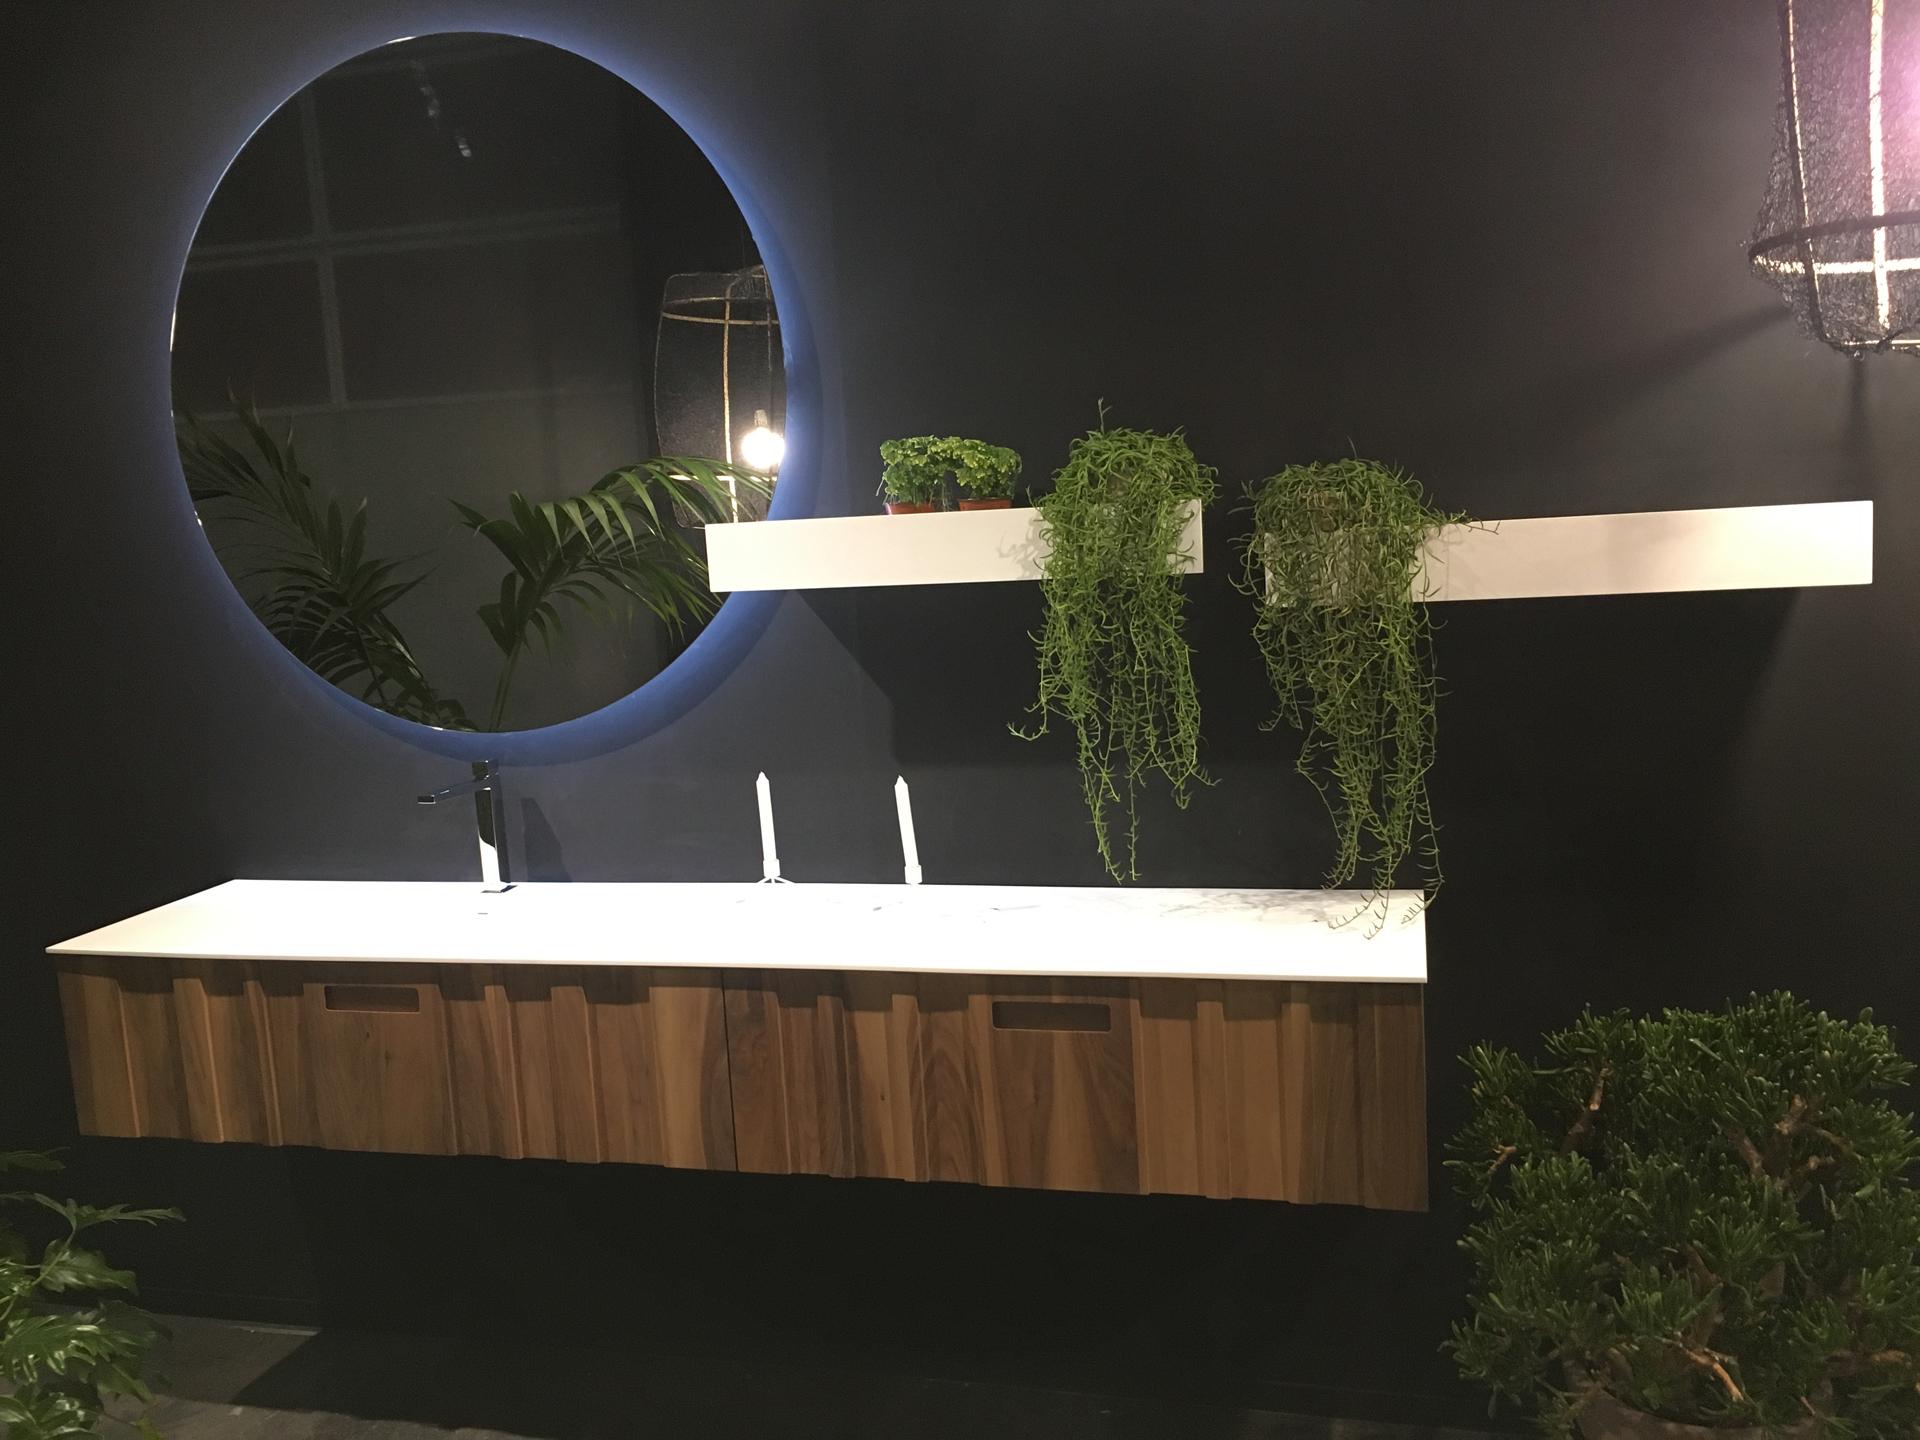 feria-cevisama-valencia-2018-decoracion-interiorismo-8